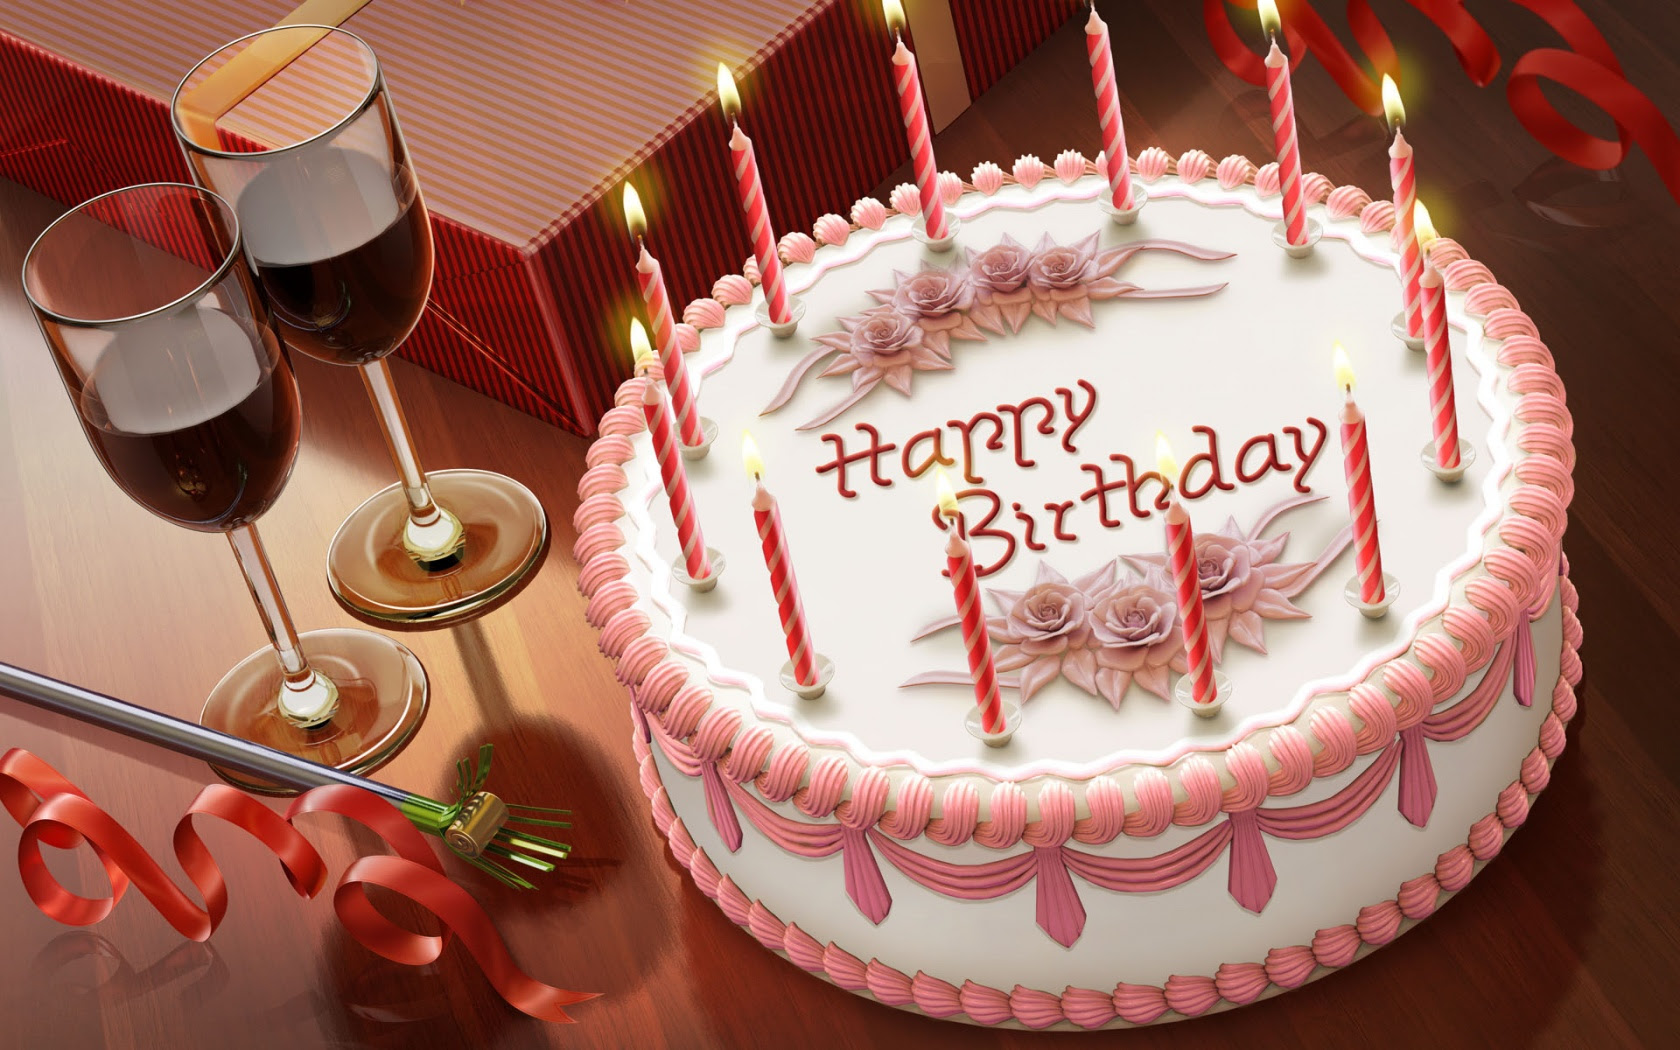 Free Happy Birthday Wallpaper 1680x1050 81112